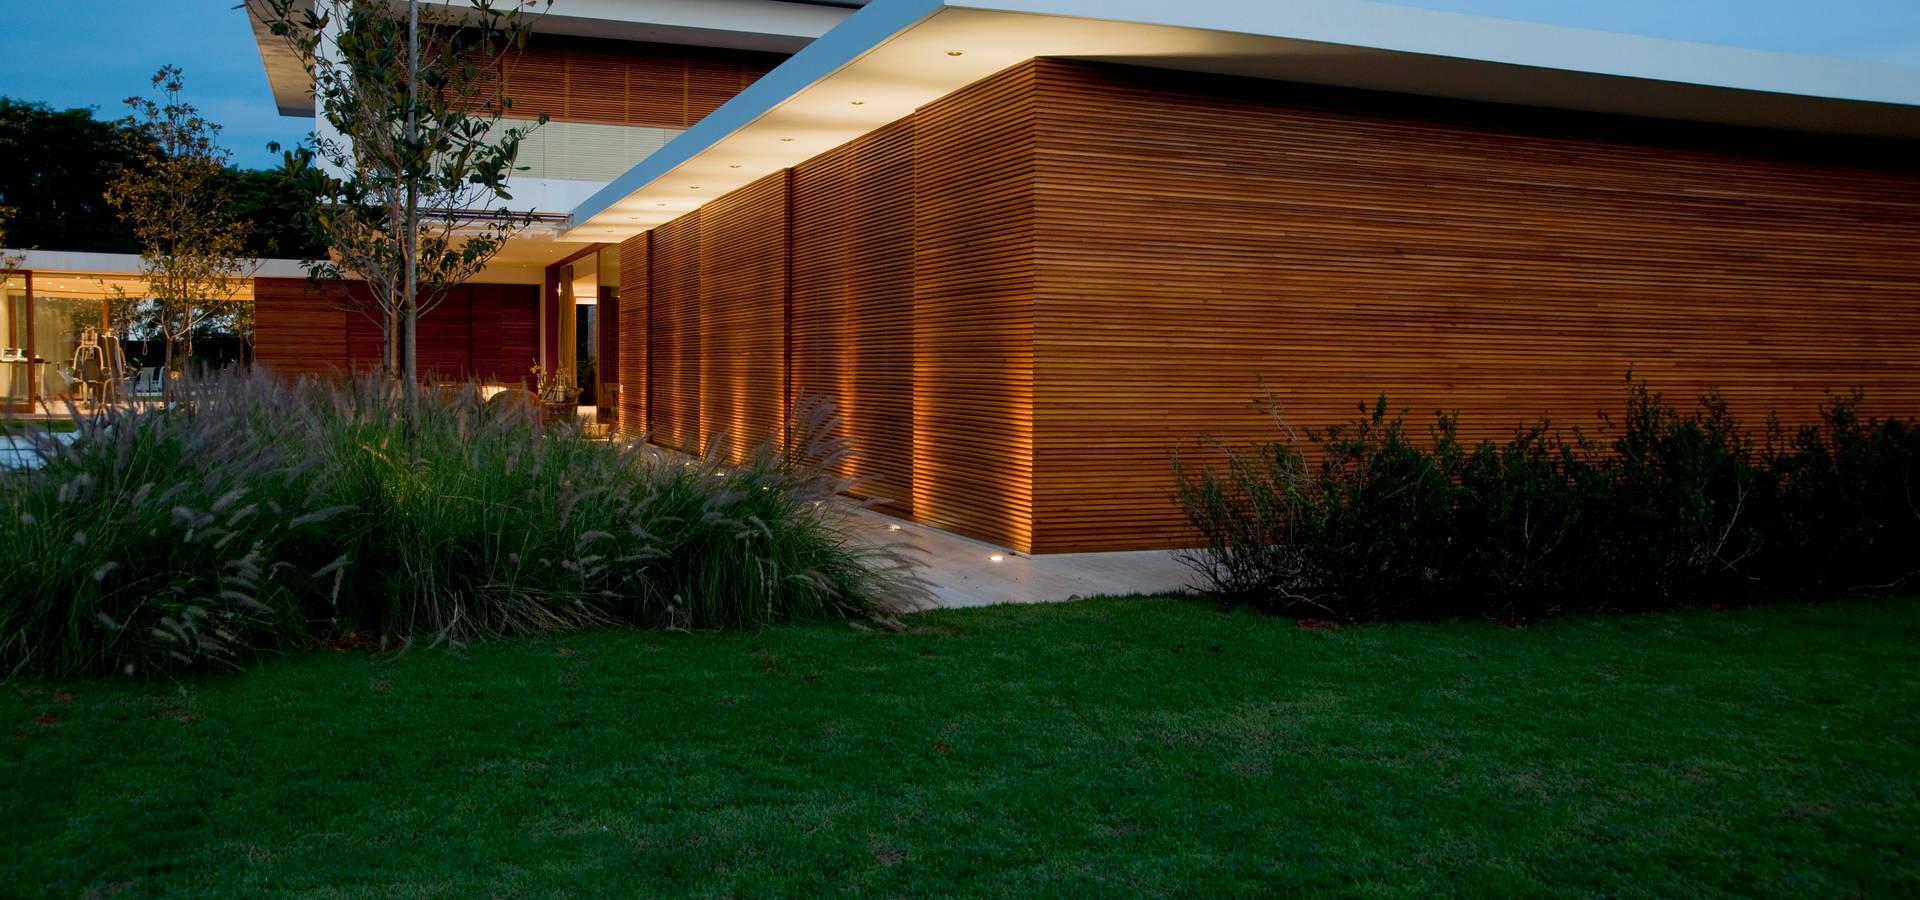 isis chaulon arquitetura